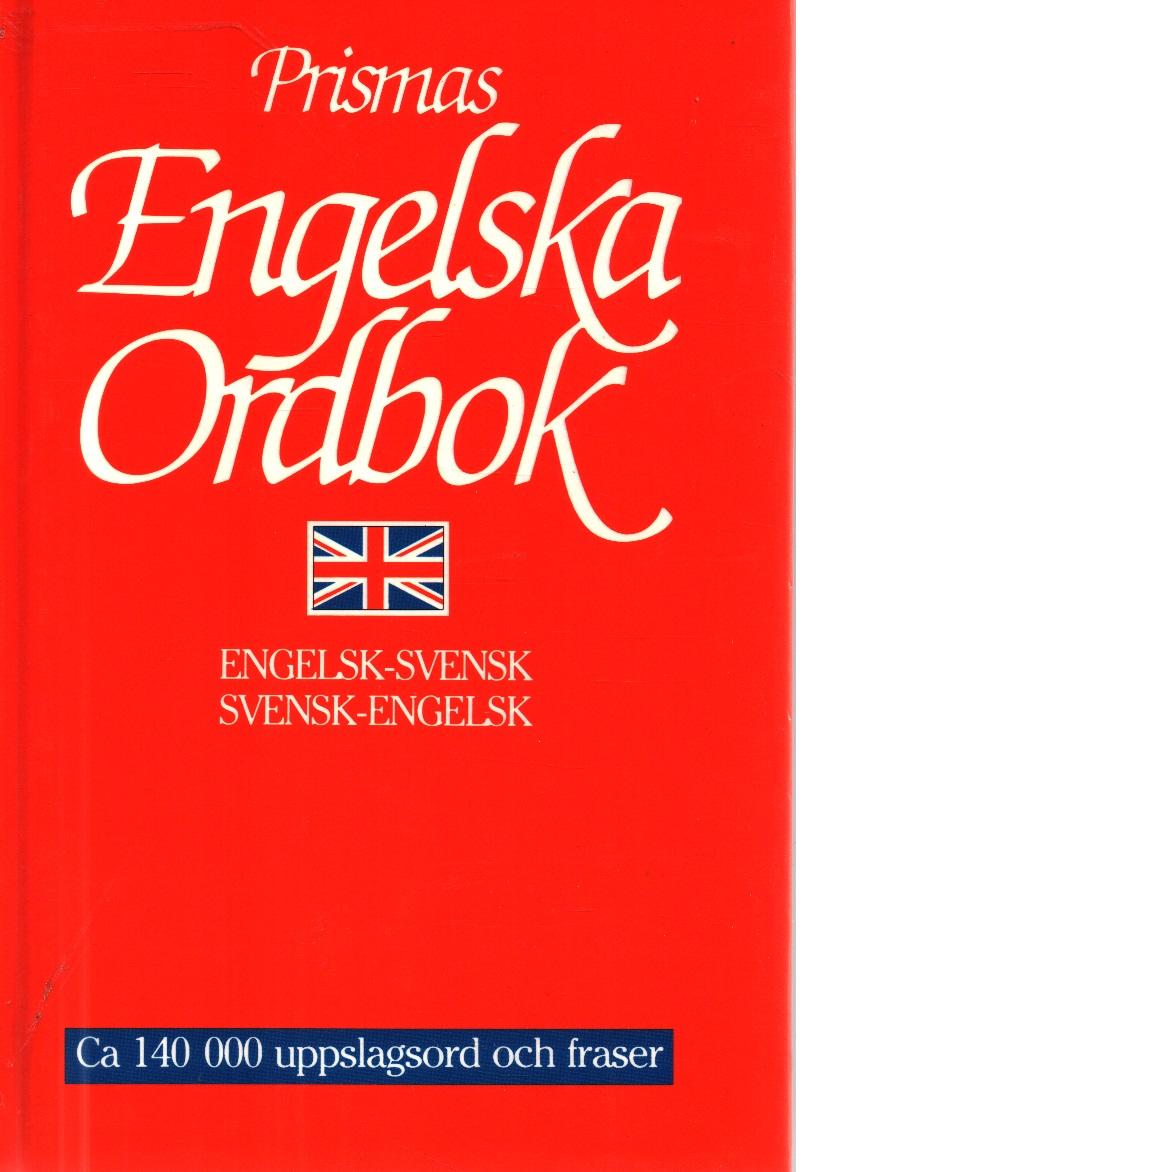 Prismas engelska ordbok : engelsk-svensk, svensk-engelsk : [ca 140000 uppslagsord och fraser] - Red.